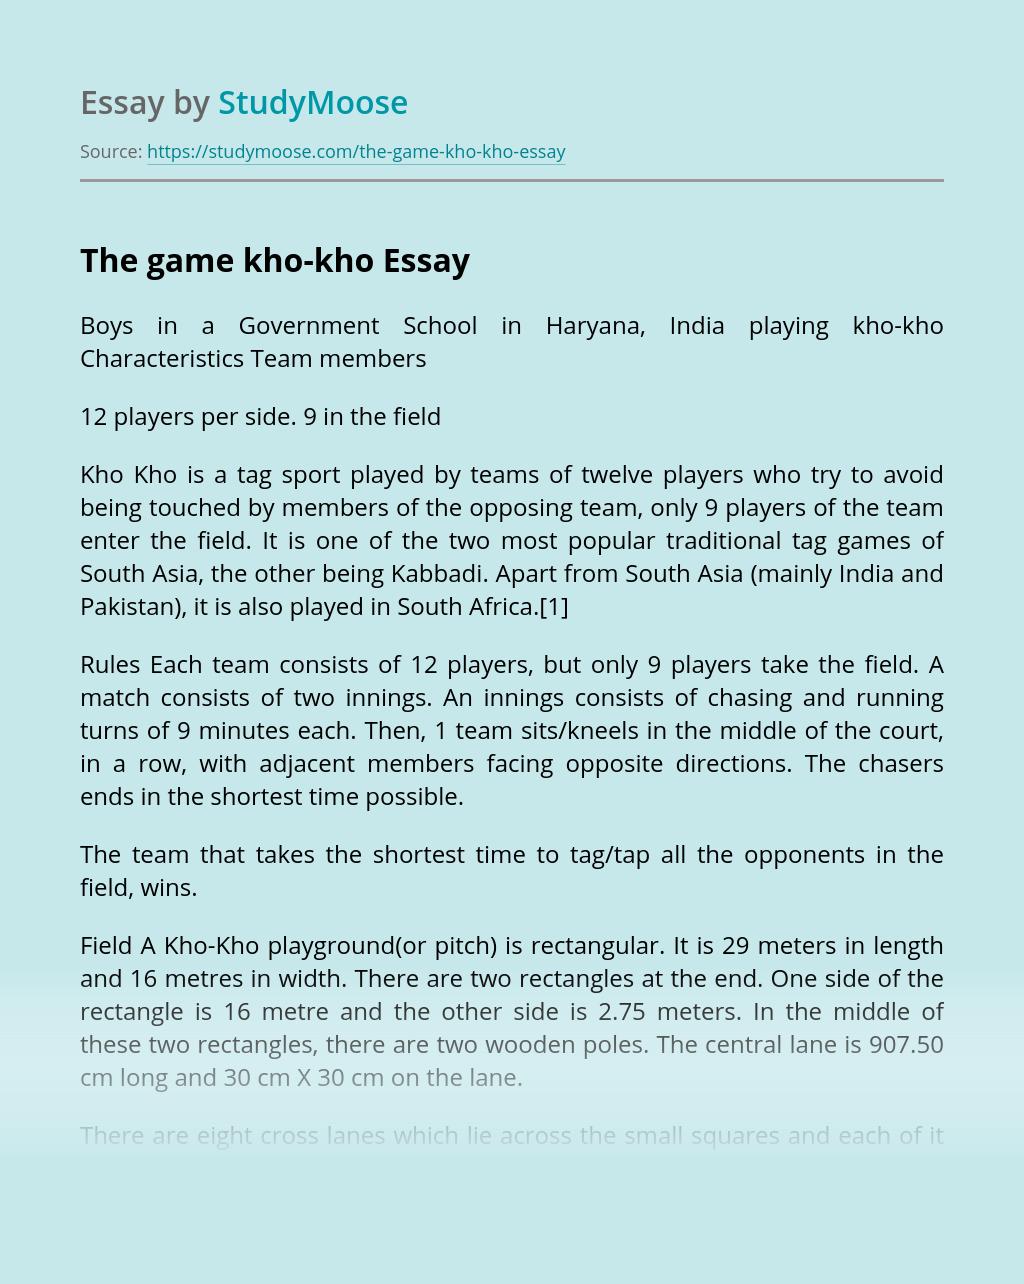 The game kho-kho